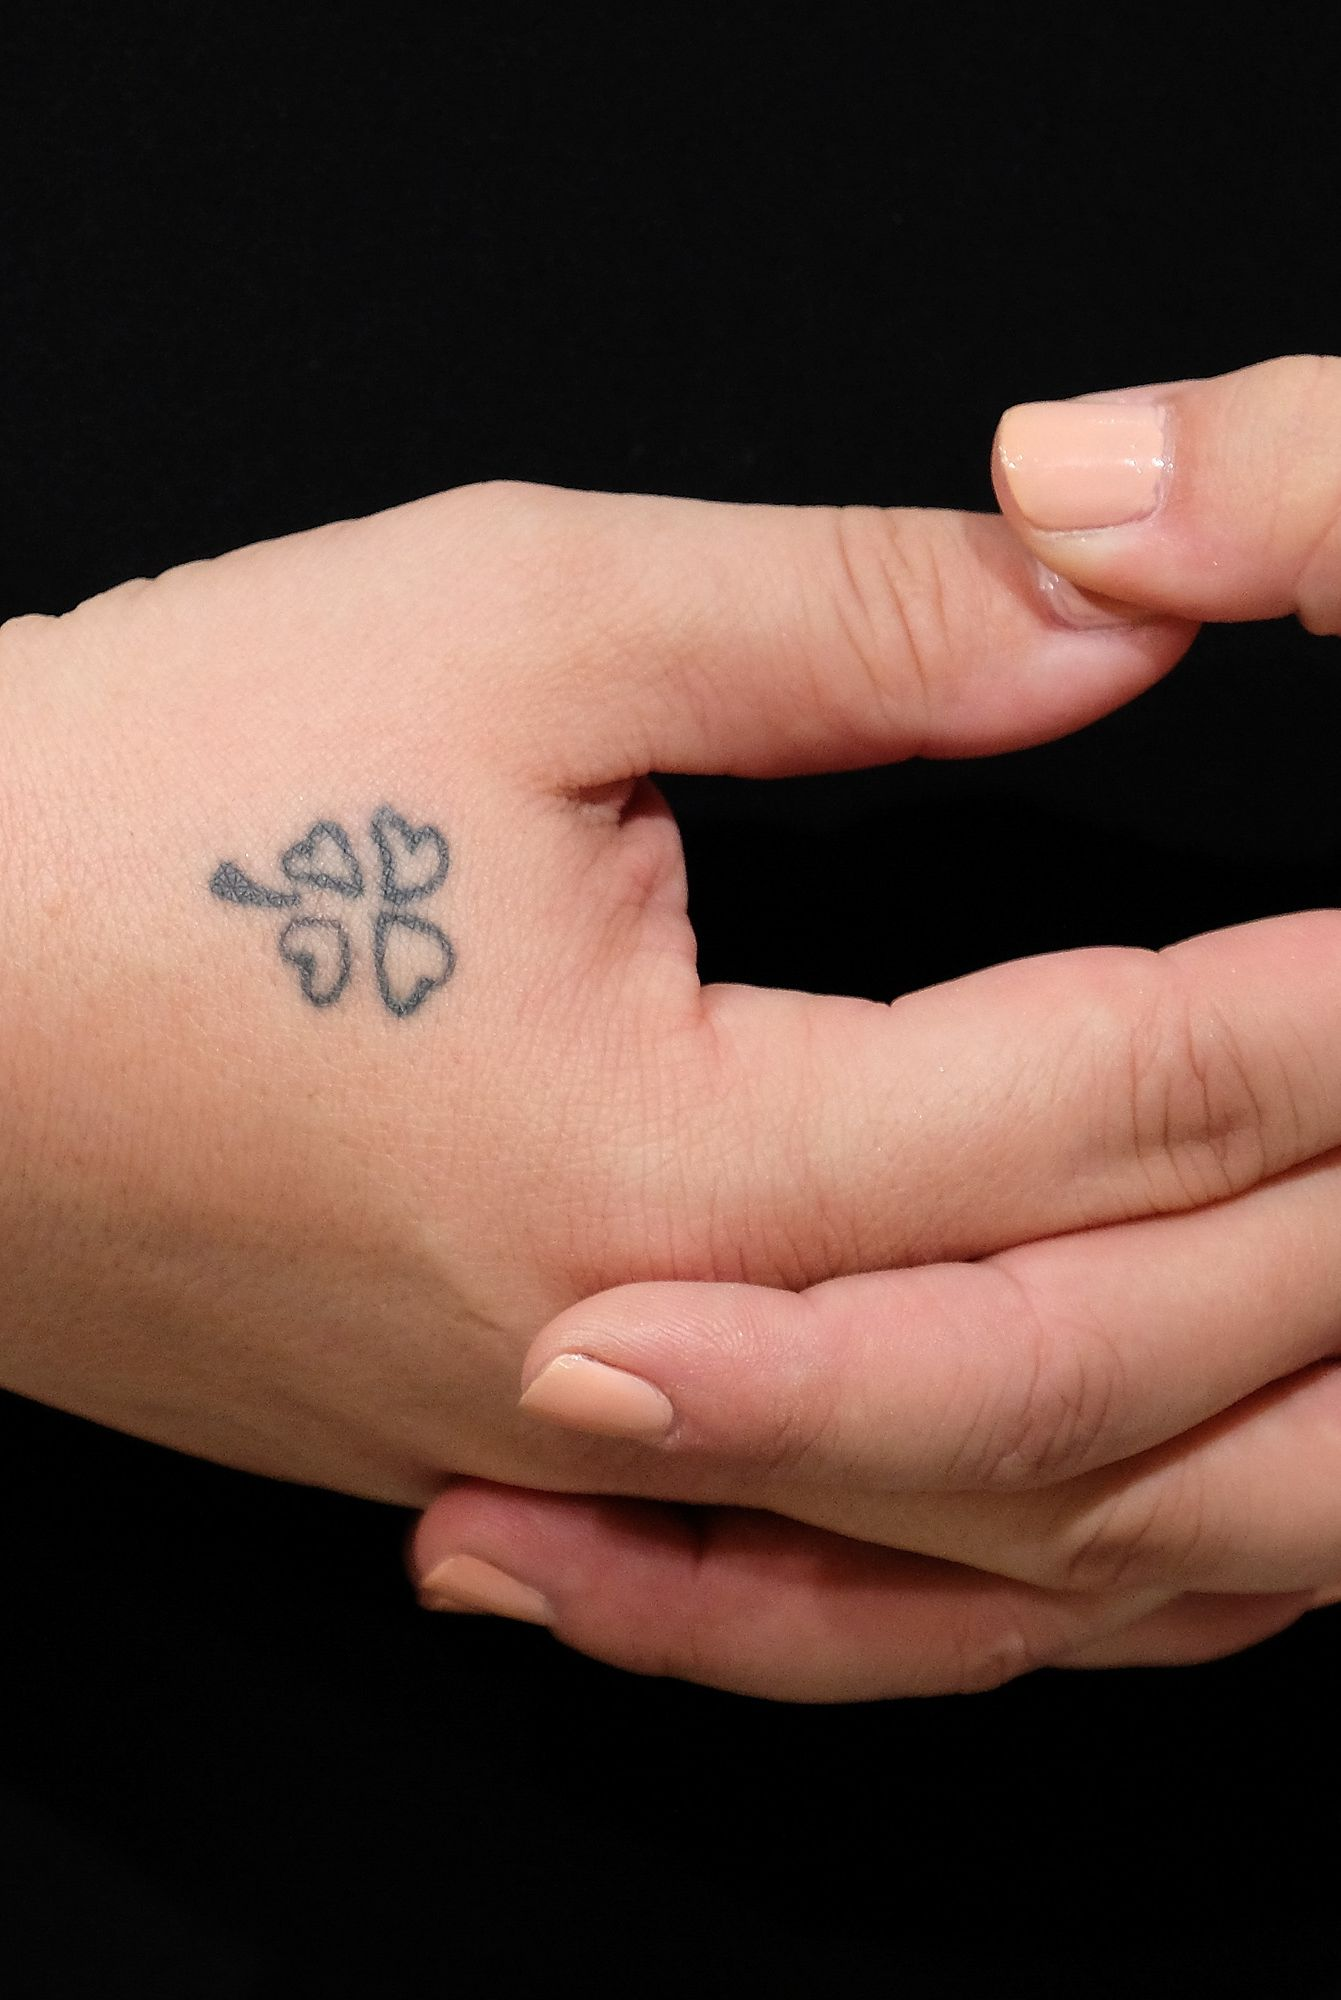 35 Small Tattoo Ideas For Women Tiny Tattoo Design Inspiration